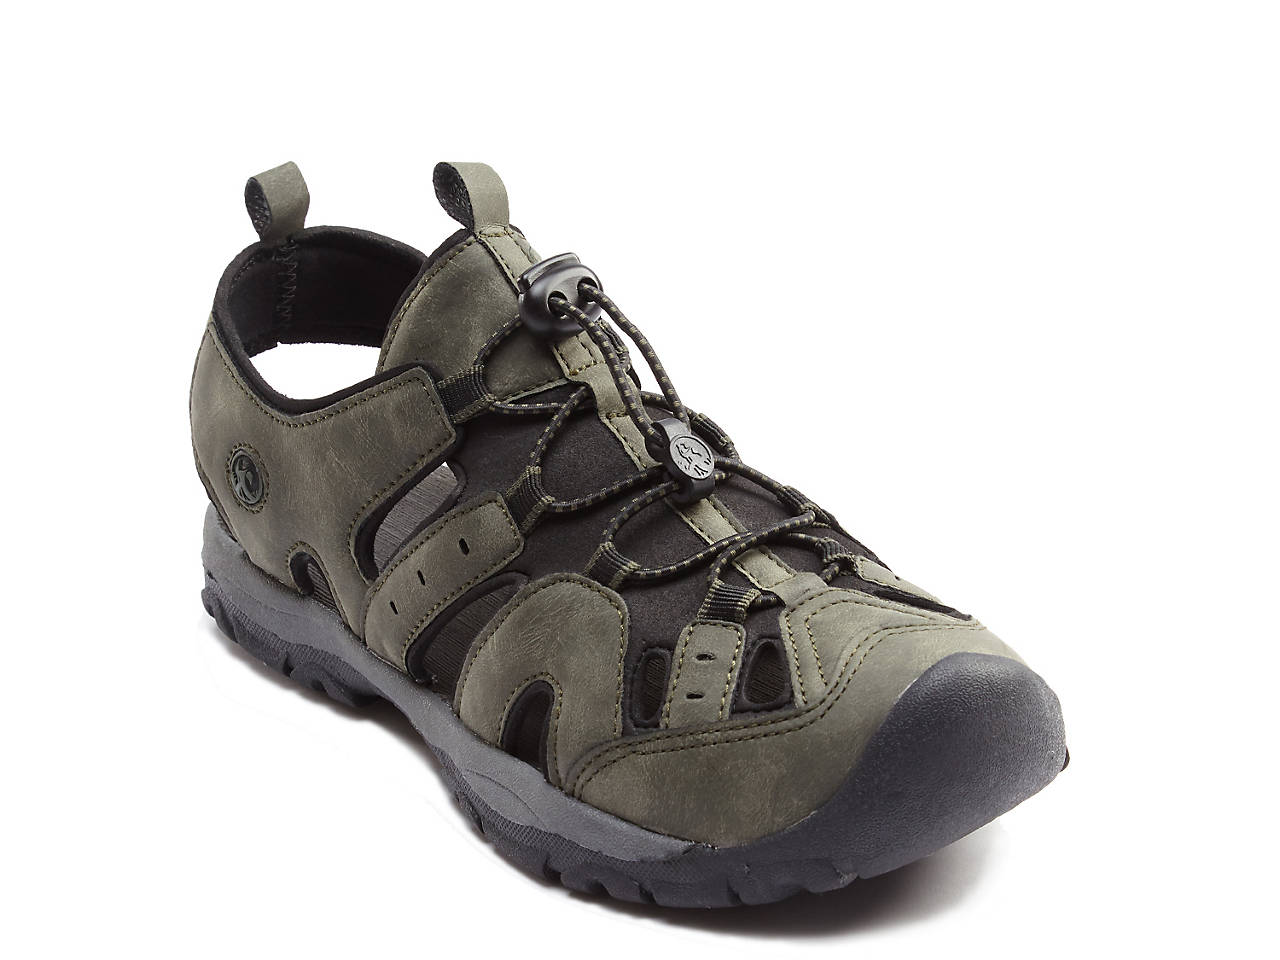 ee9f3b5121dc Northside Burke II Fisherman Sandal Men s Shoes